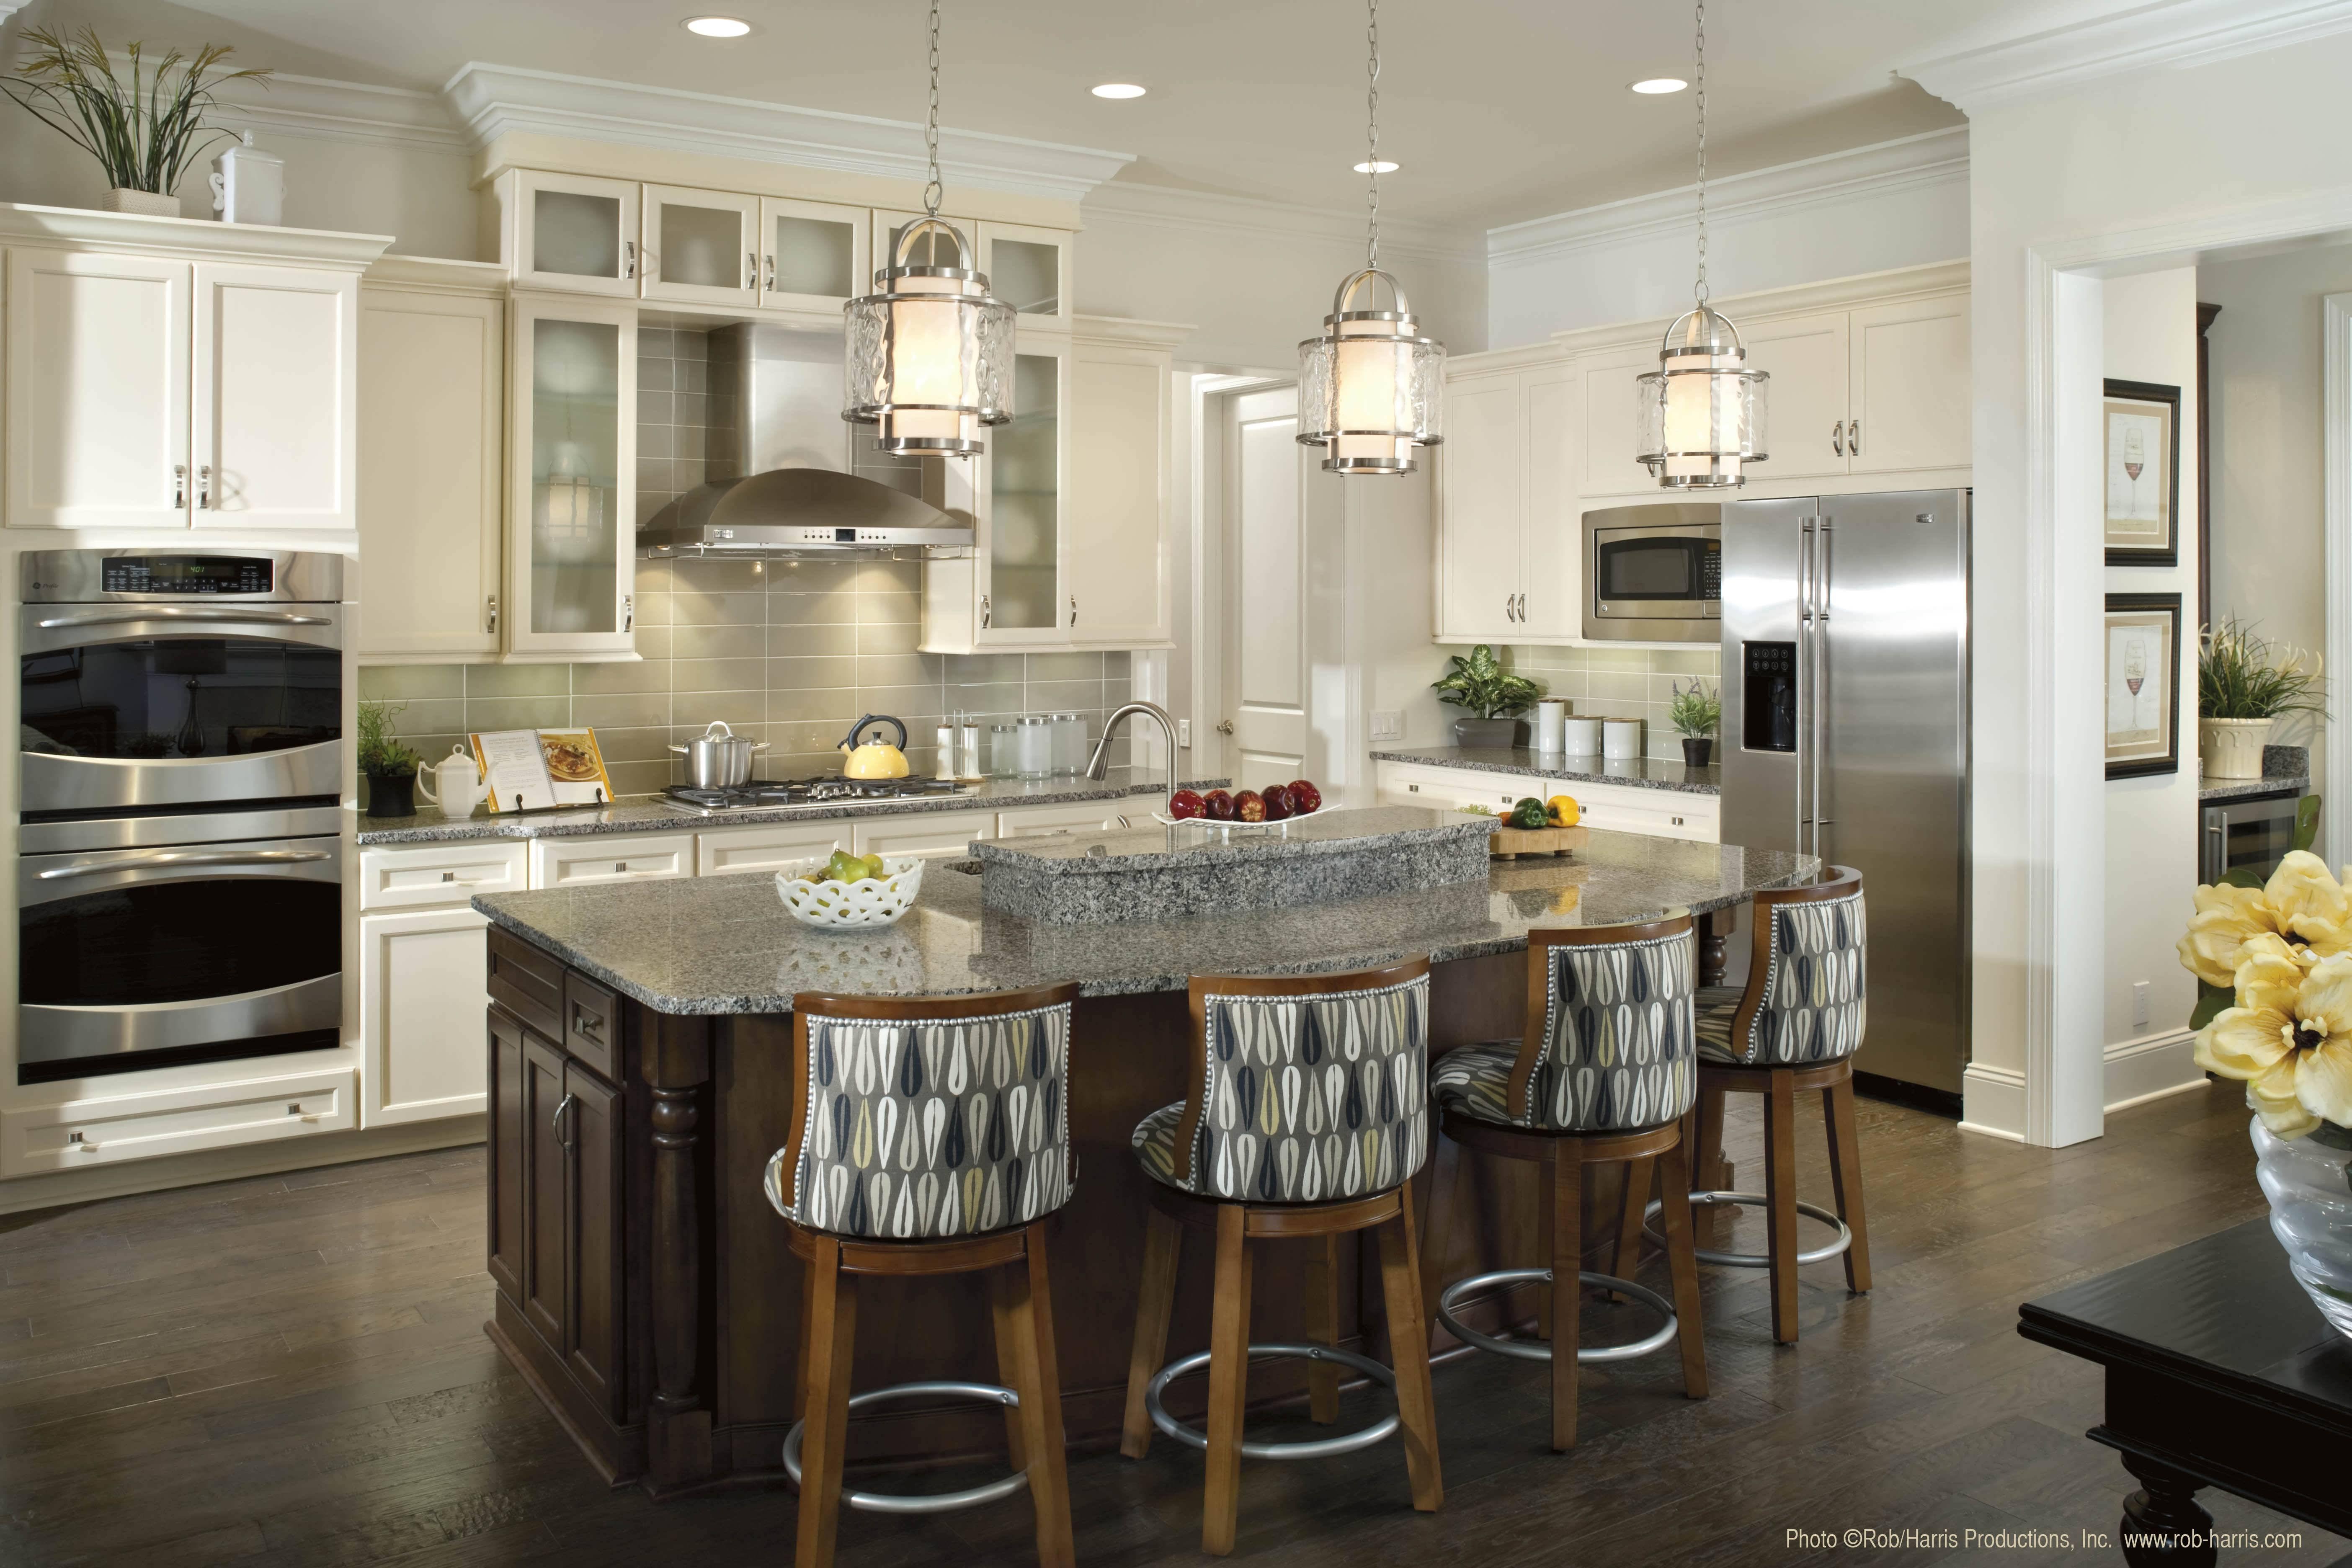 Kitchen : Pendant Kitchen Island Lights Light Fixtures For The inside Mini Pendants Lights For Kitchen Island (Image 4 of 15)